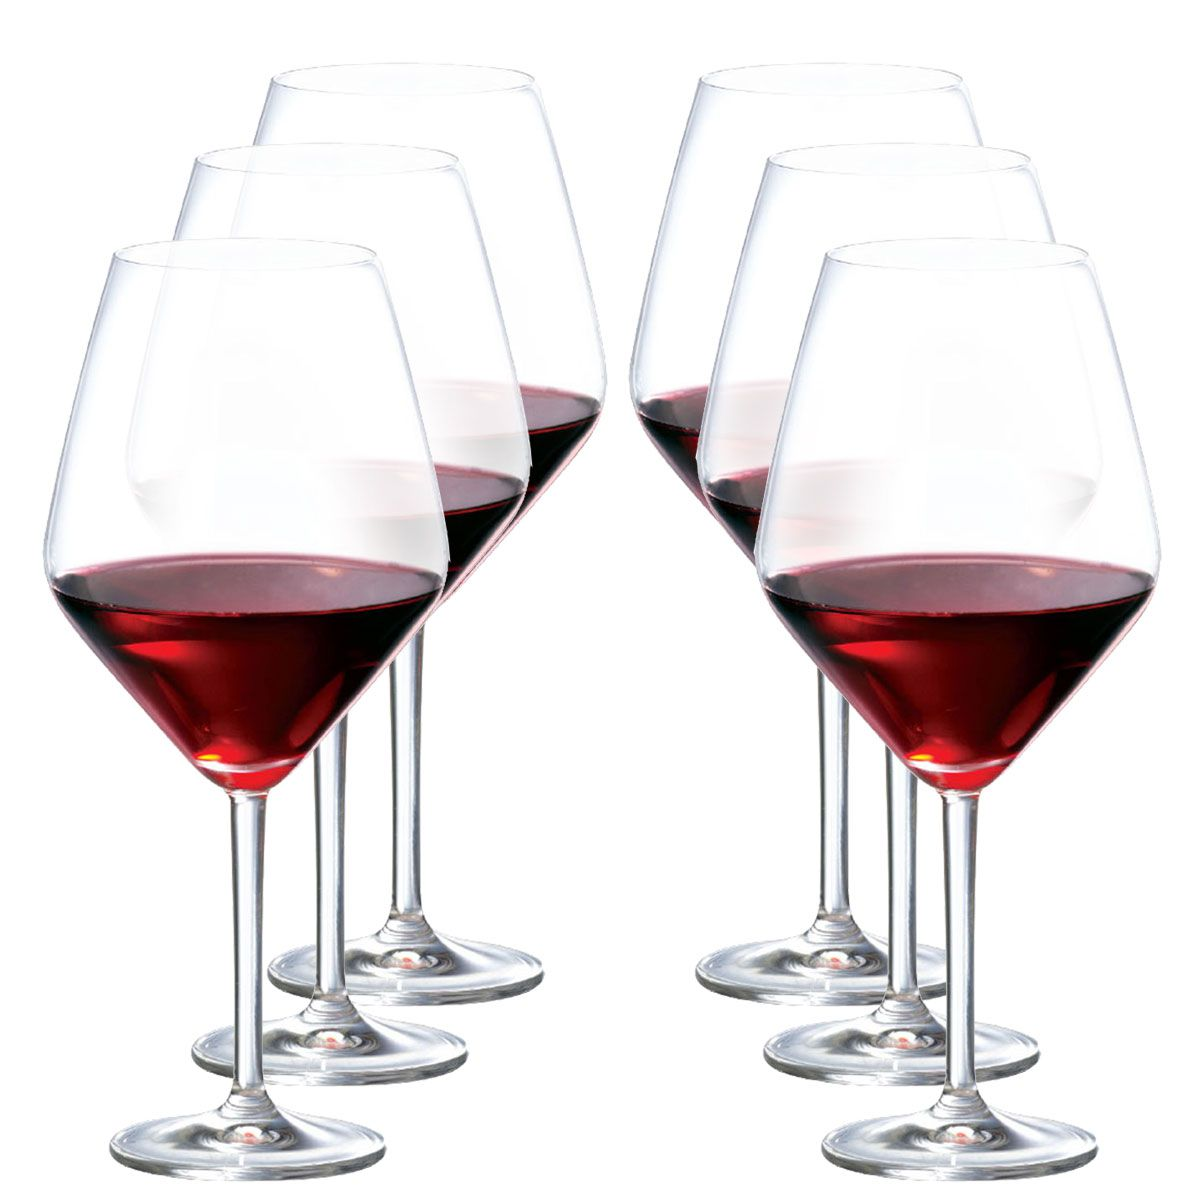 Taça Vinho - Cristal Elegance Vinho Tinto 775 Ml C/ 6 Unid